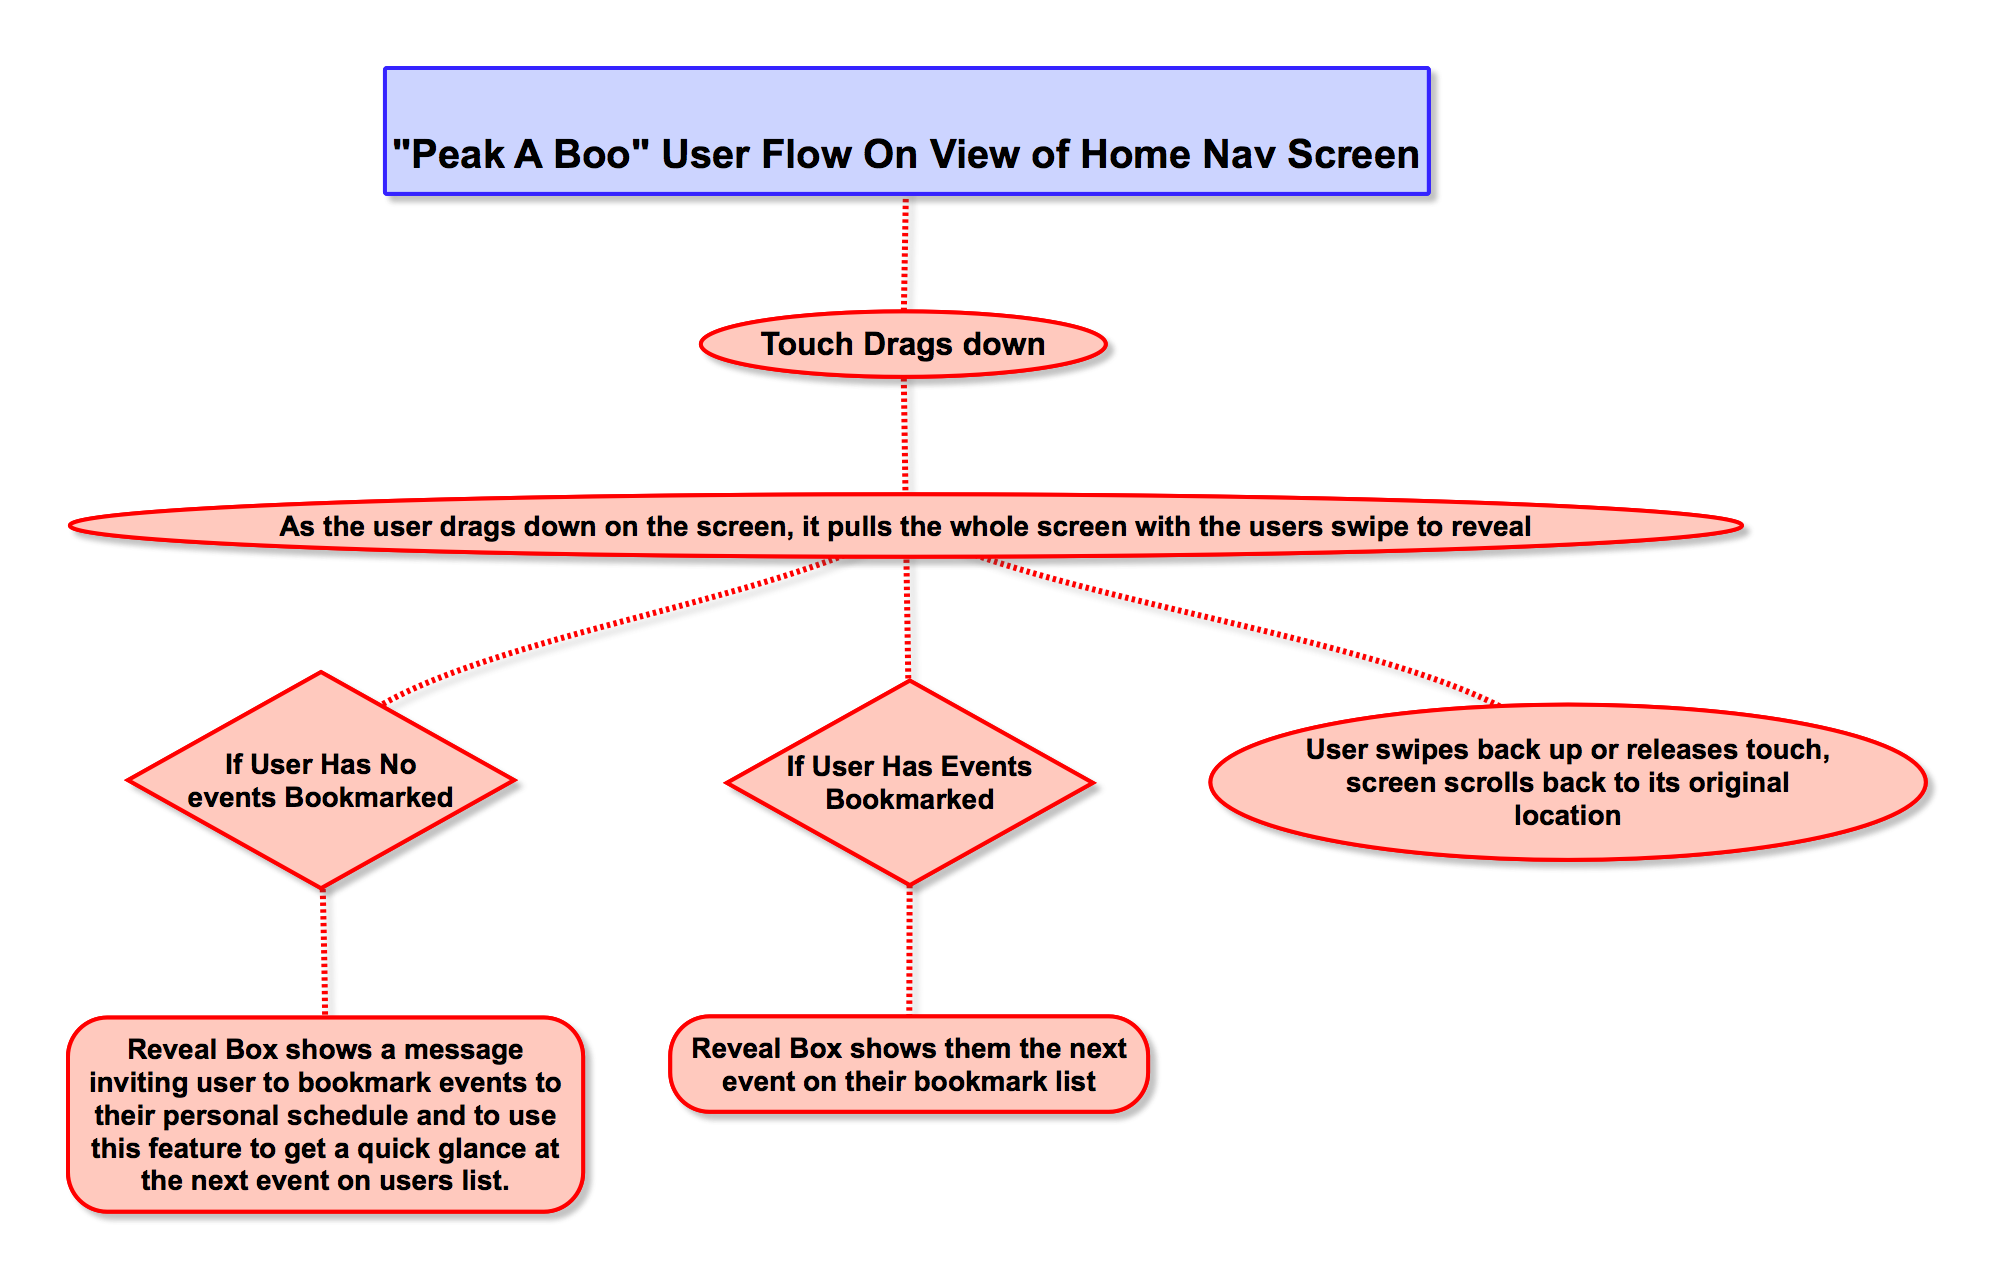 User flow 1 describes the Peek a Boo feature.